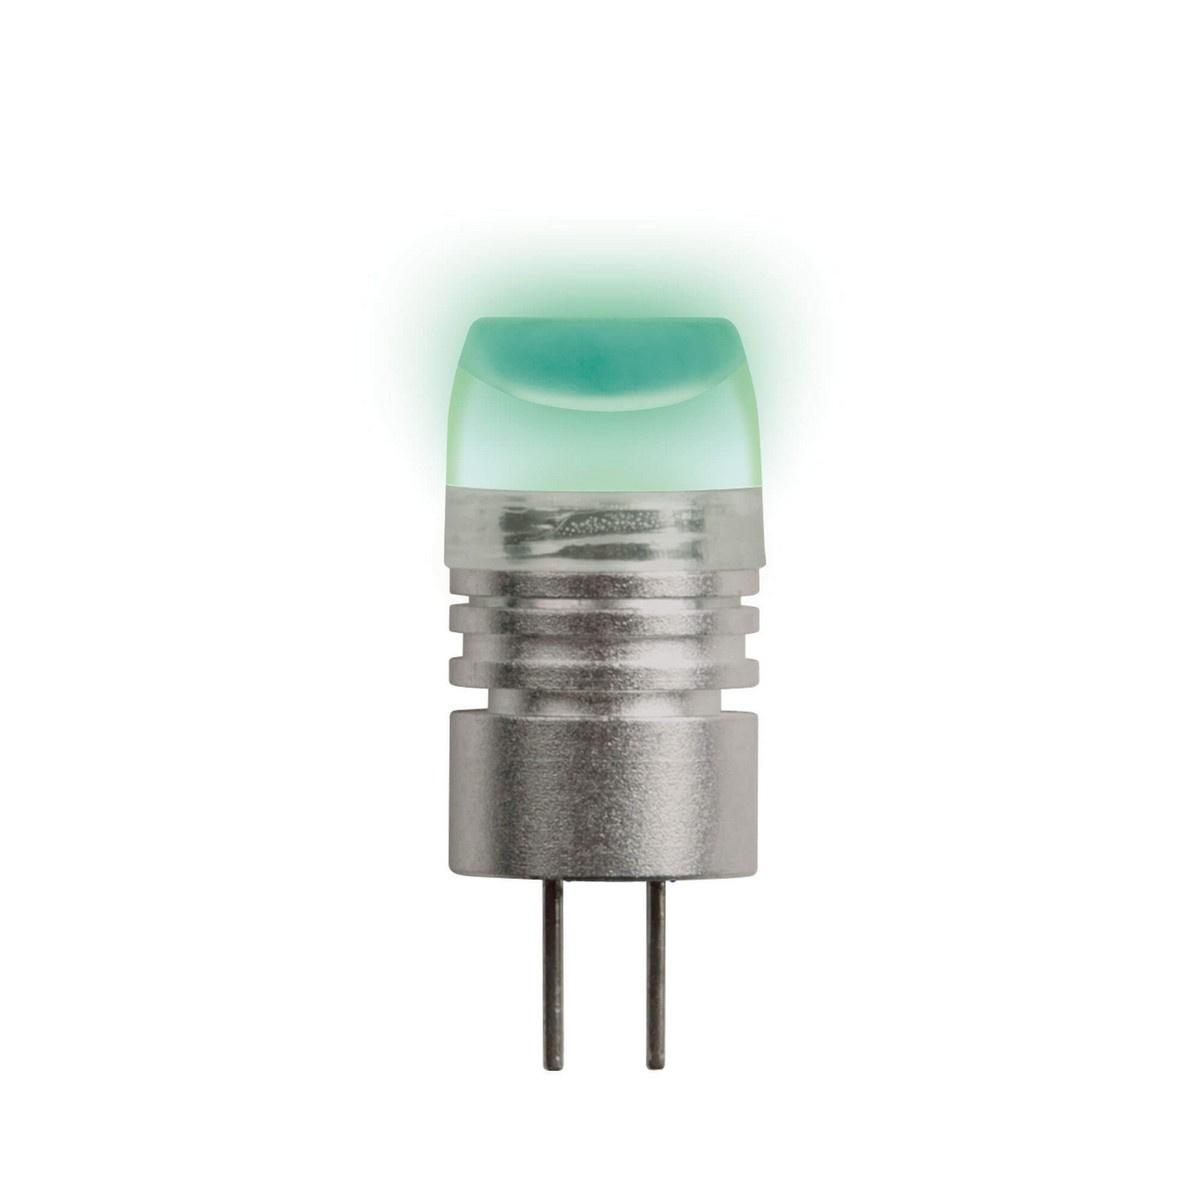 Лампа светодиодная (05858) G4 0,8W прозрачная LED-JC-12/0,8W/GREEN/G4 uniel лампа галогенная uniel капсула прозрачная g4 35w jc 220 35 g4 cl 02585